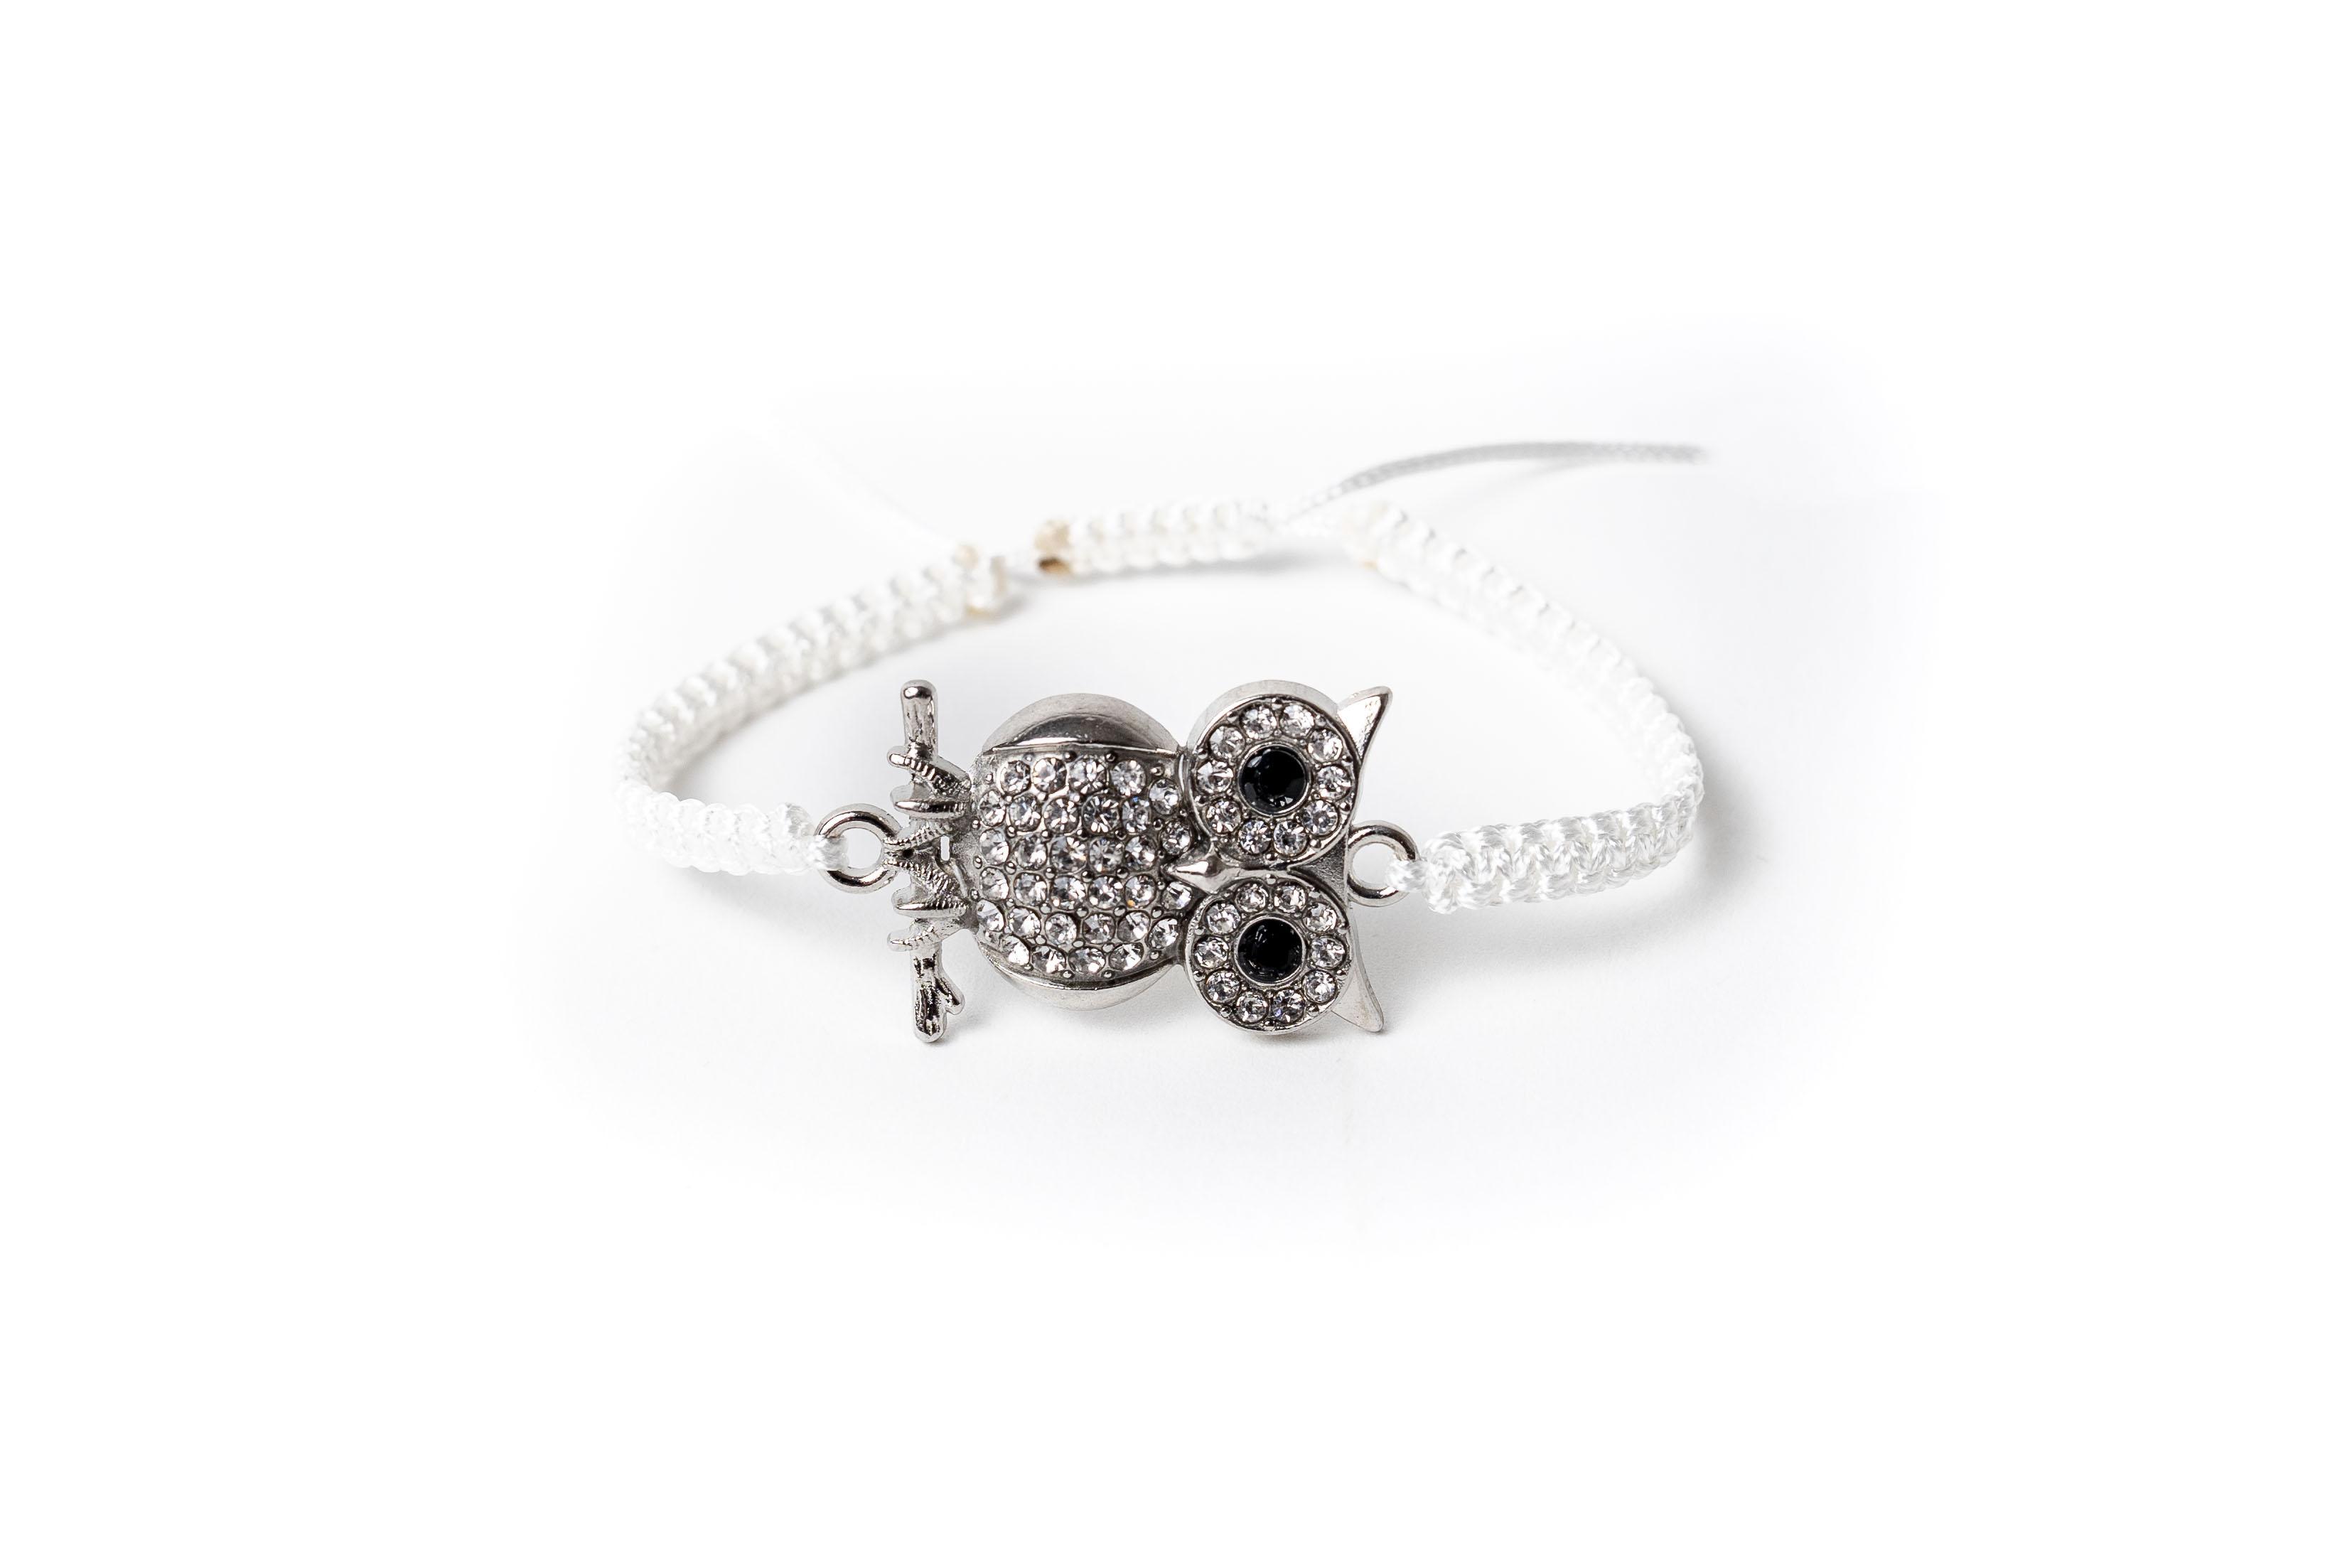 Macramé náramek sova s krystaly Bílá, Pánský náramek